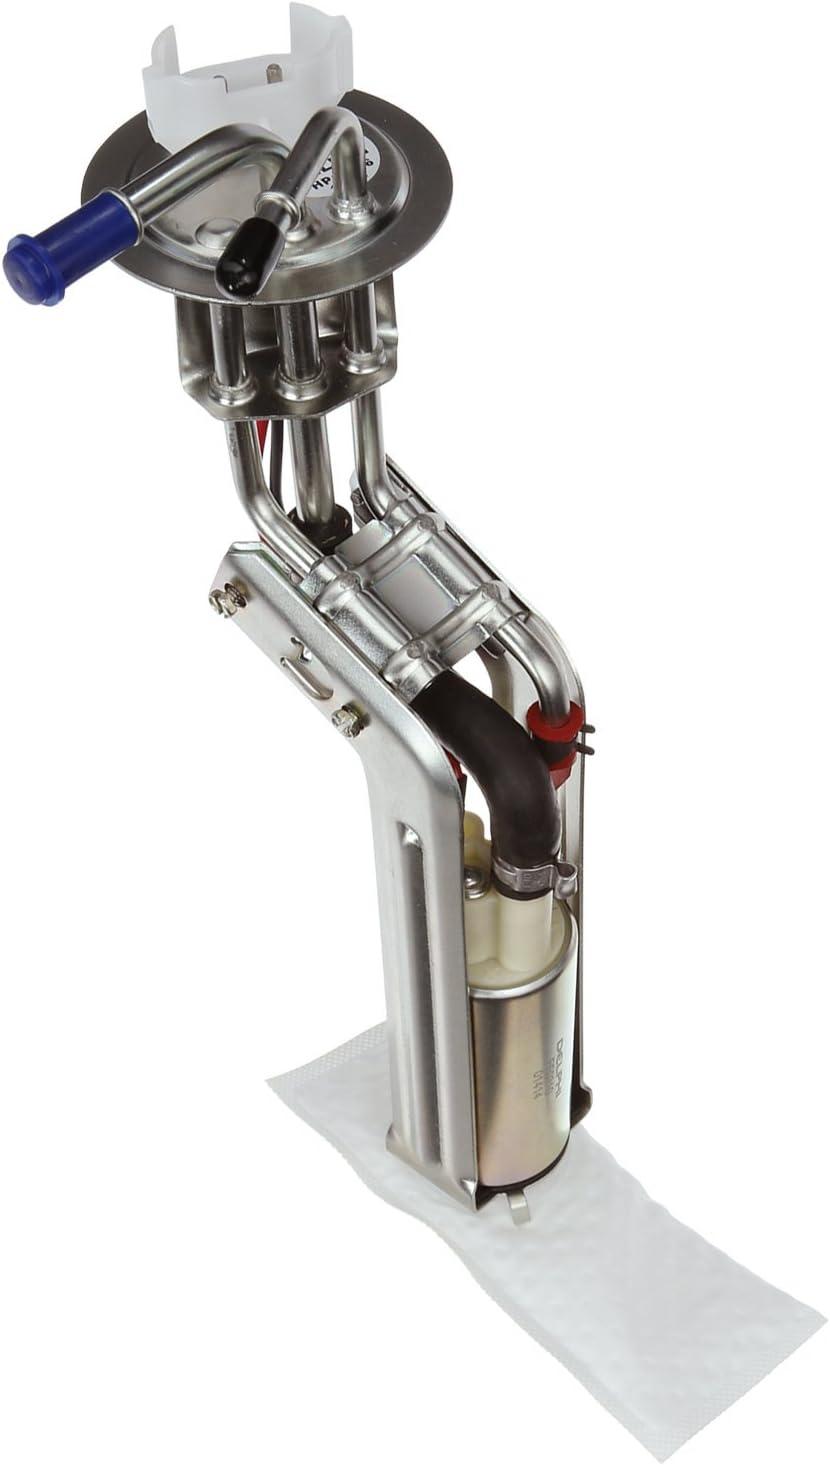 Delphi HP10146 Hanger Pump Assembly